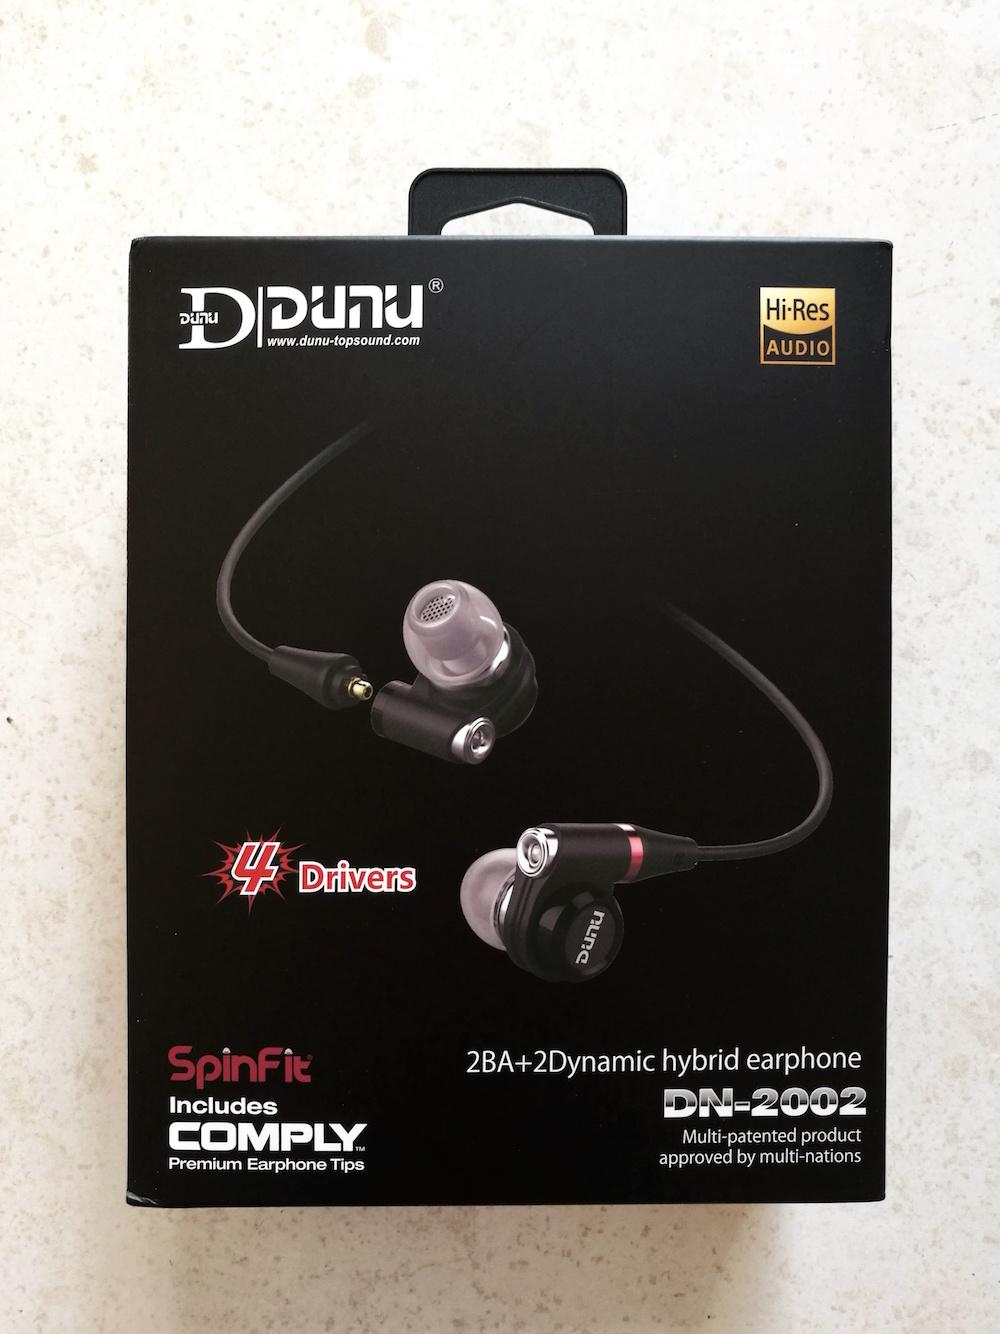 Packaging of the Dunu DN-2002 earphones.